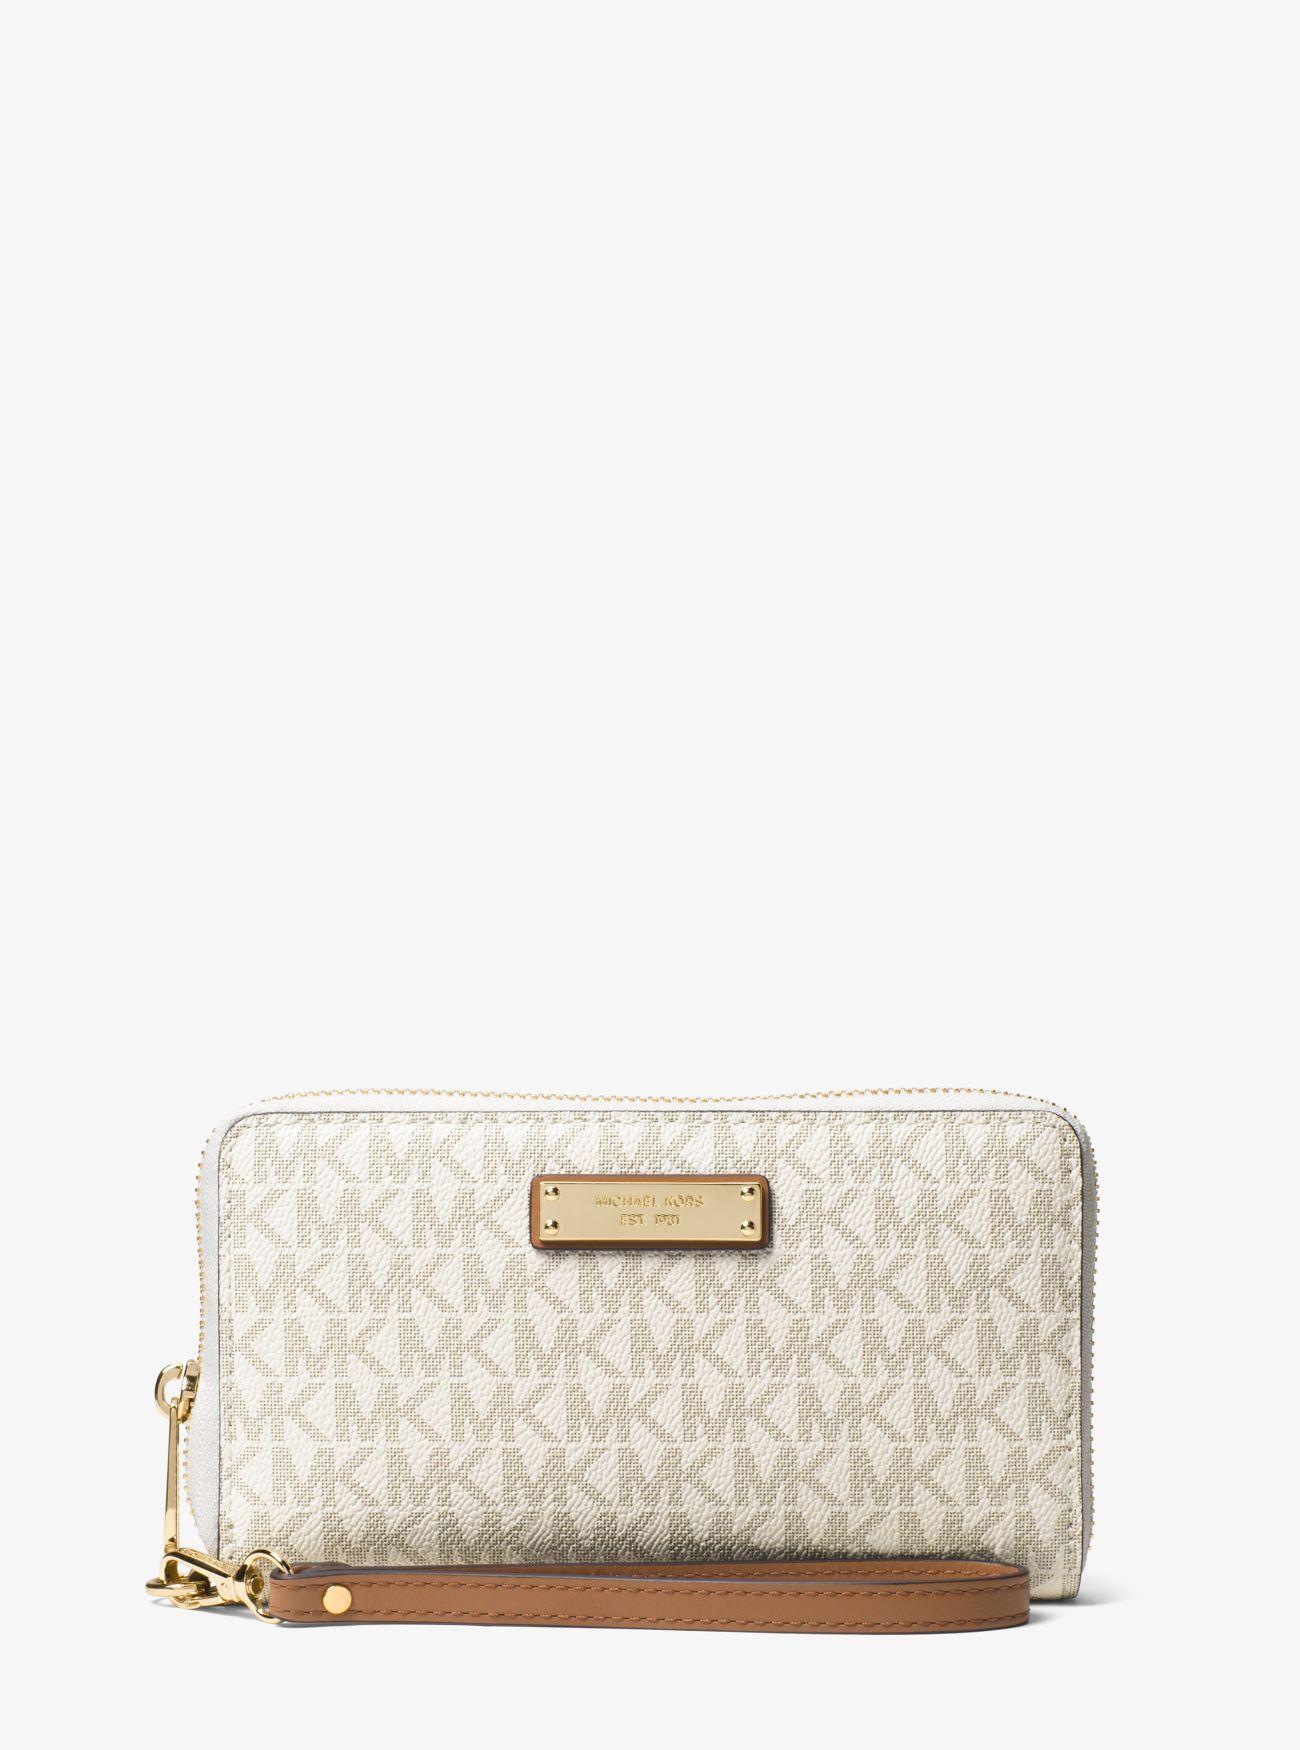 Sale Michael Kors Vanilla Jet Set Travel Logo Smartphone Wristlet Discount Online Handbags Michael Kors Purses Michael Kors Handbags Designer Michael Kors